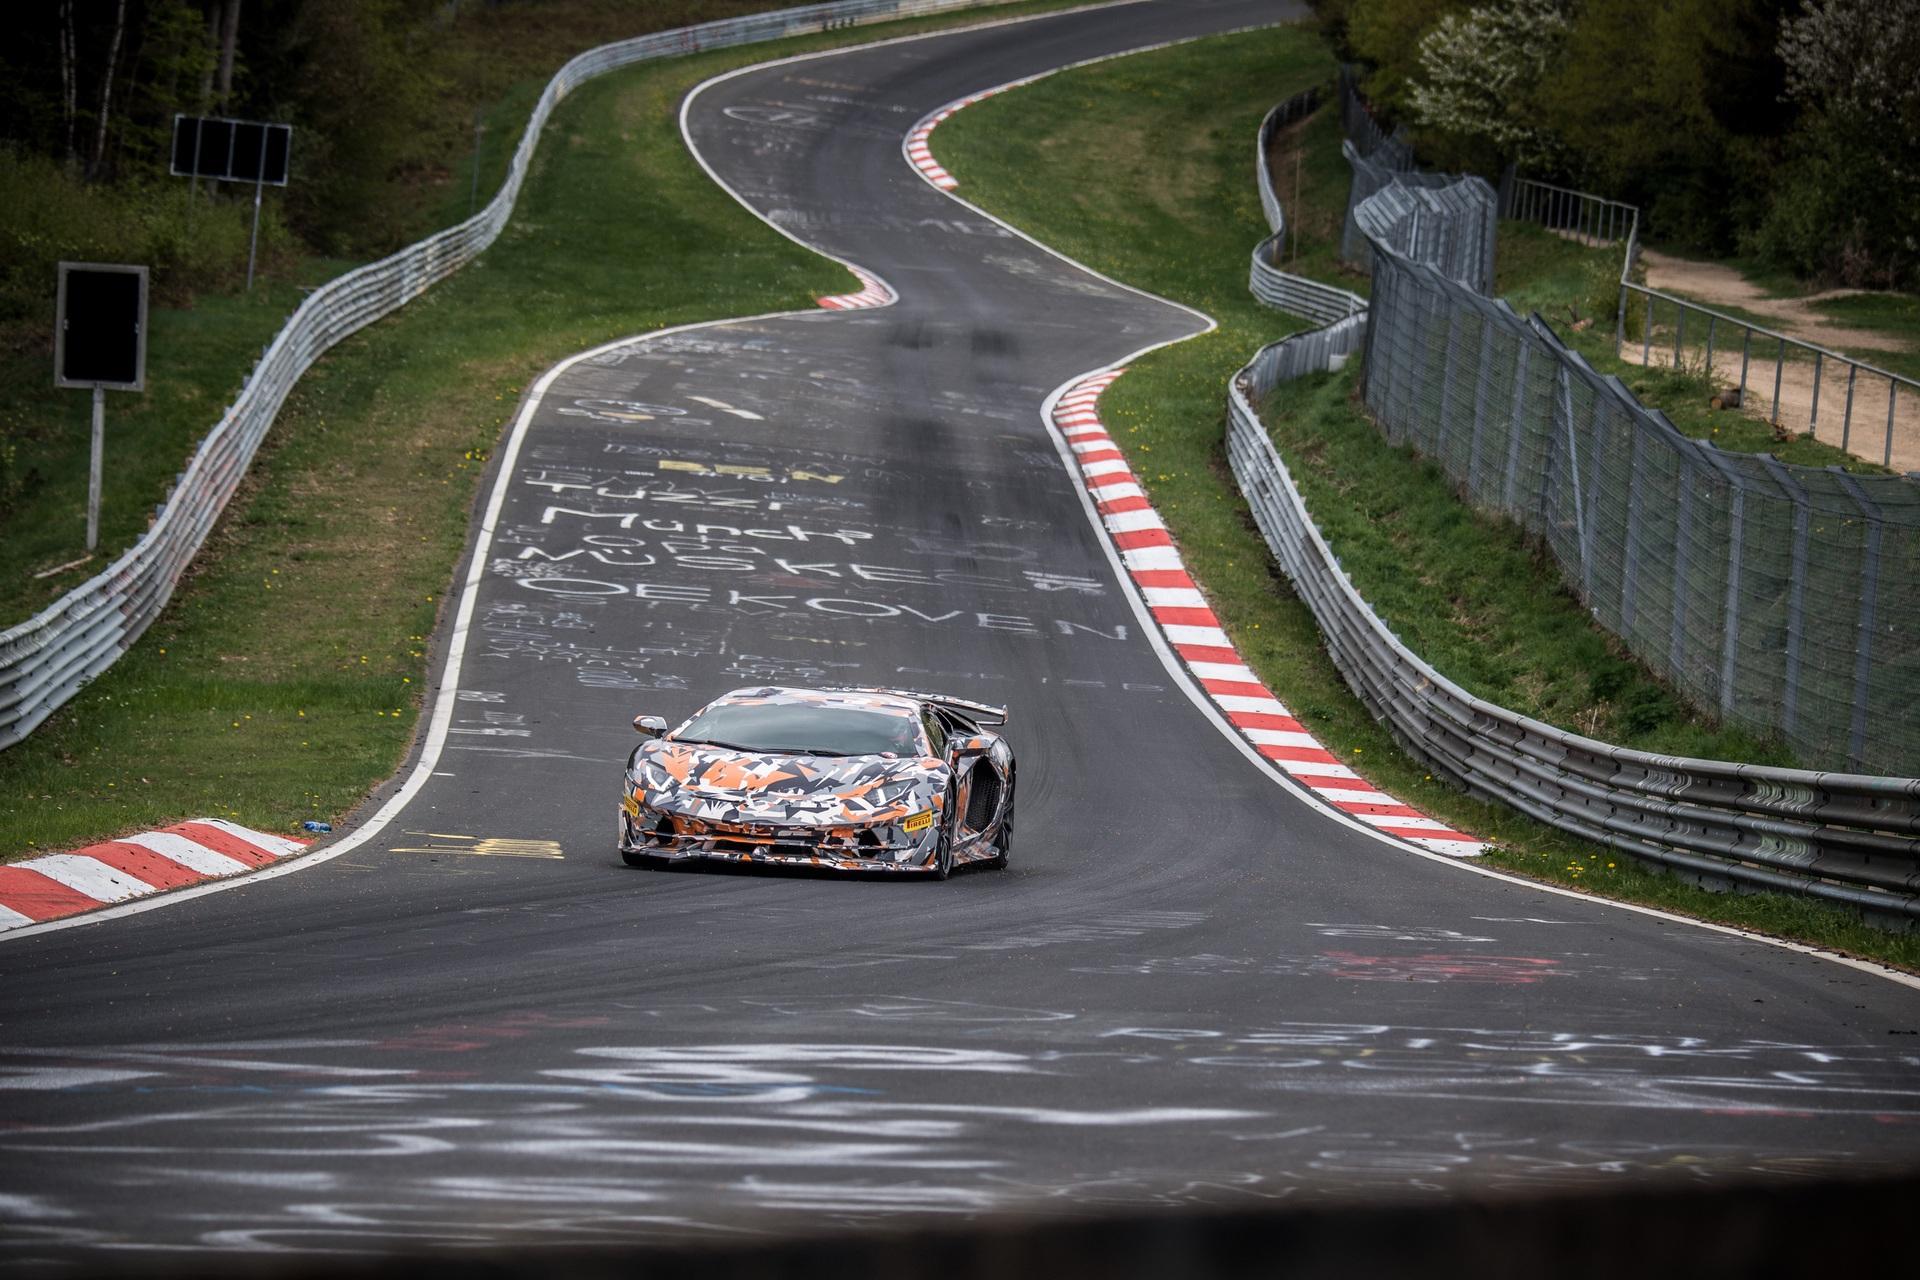 Lamborghini_Aventador_SVJ_Nurburgring_0006